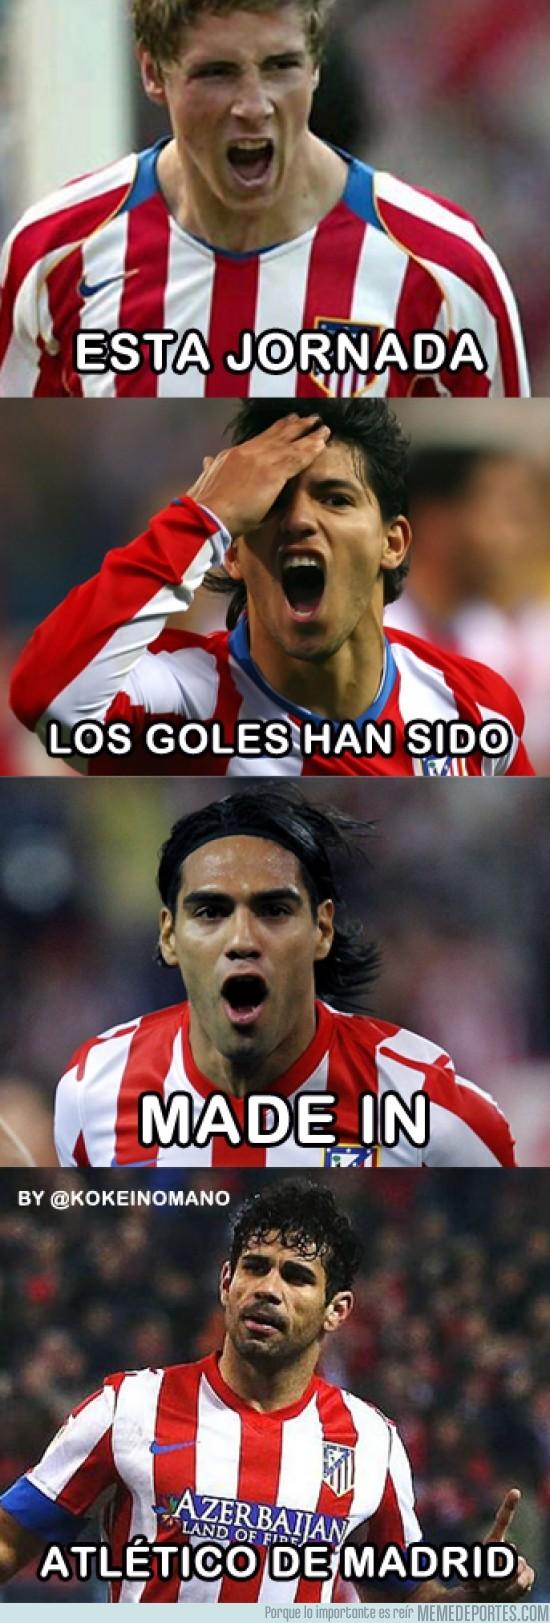 200678 - Goles made in Atlético de madrid